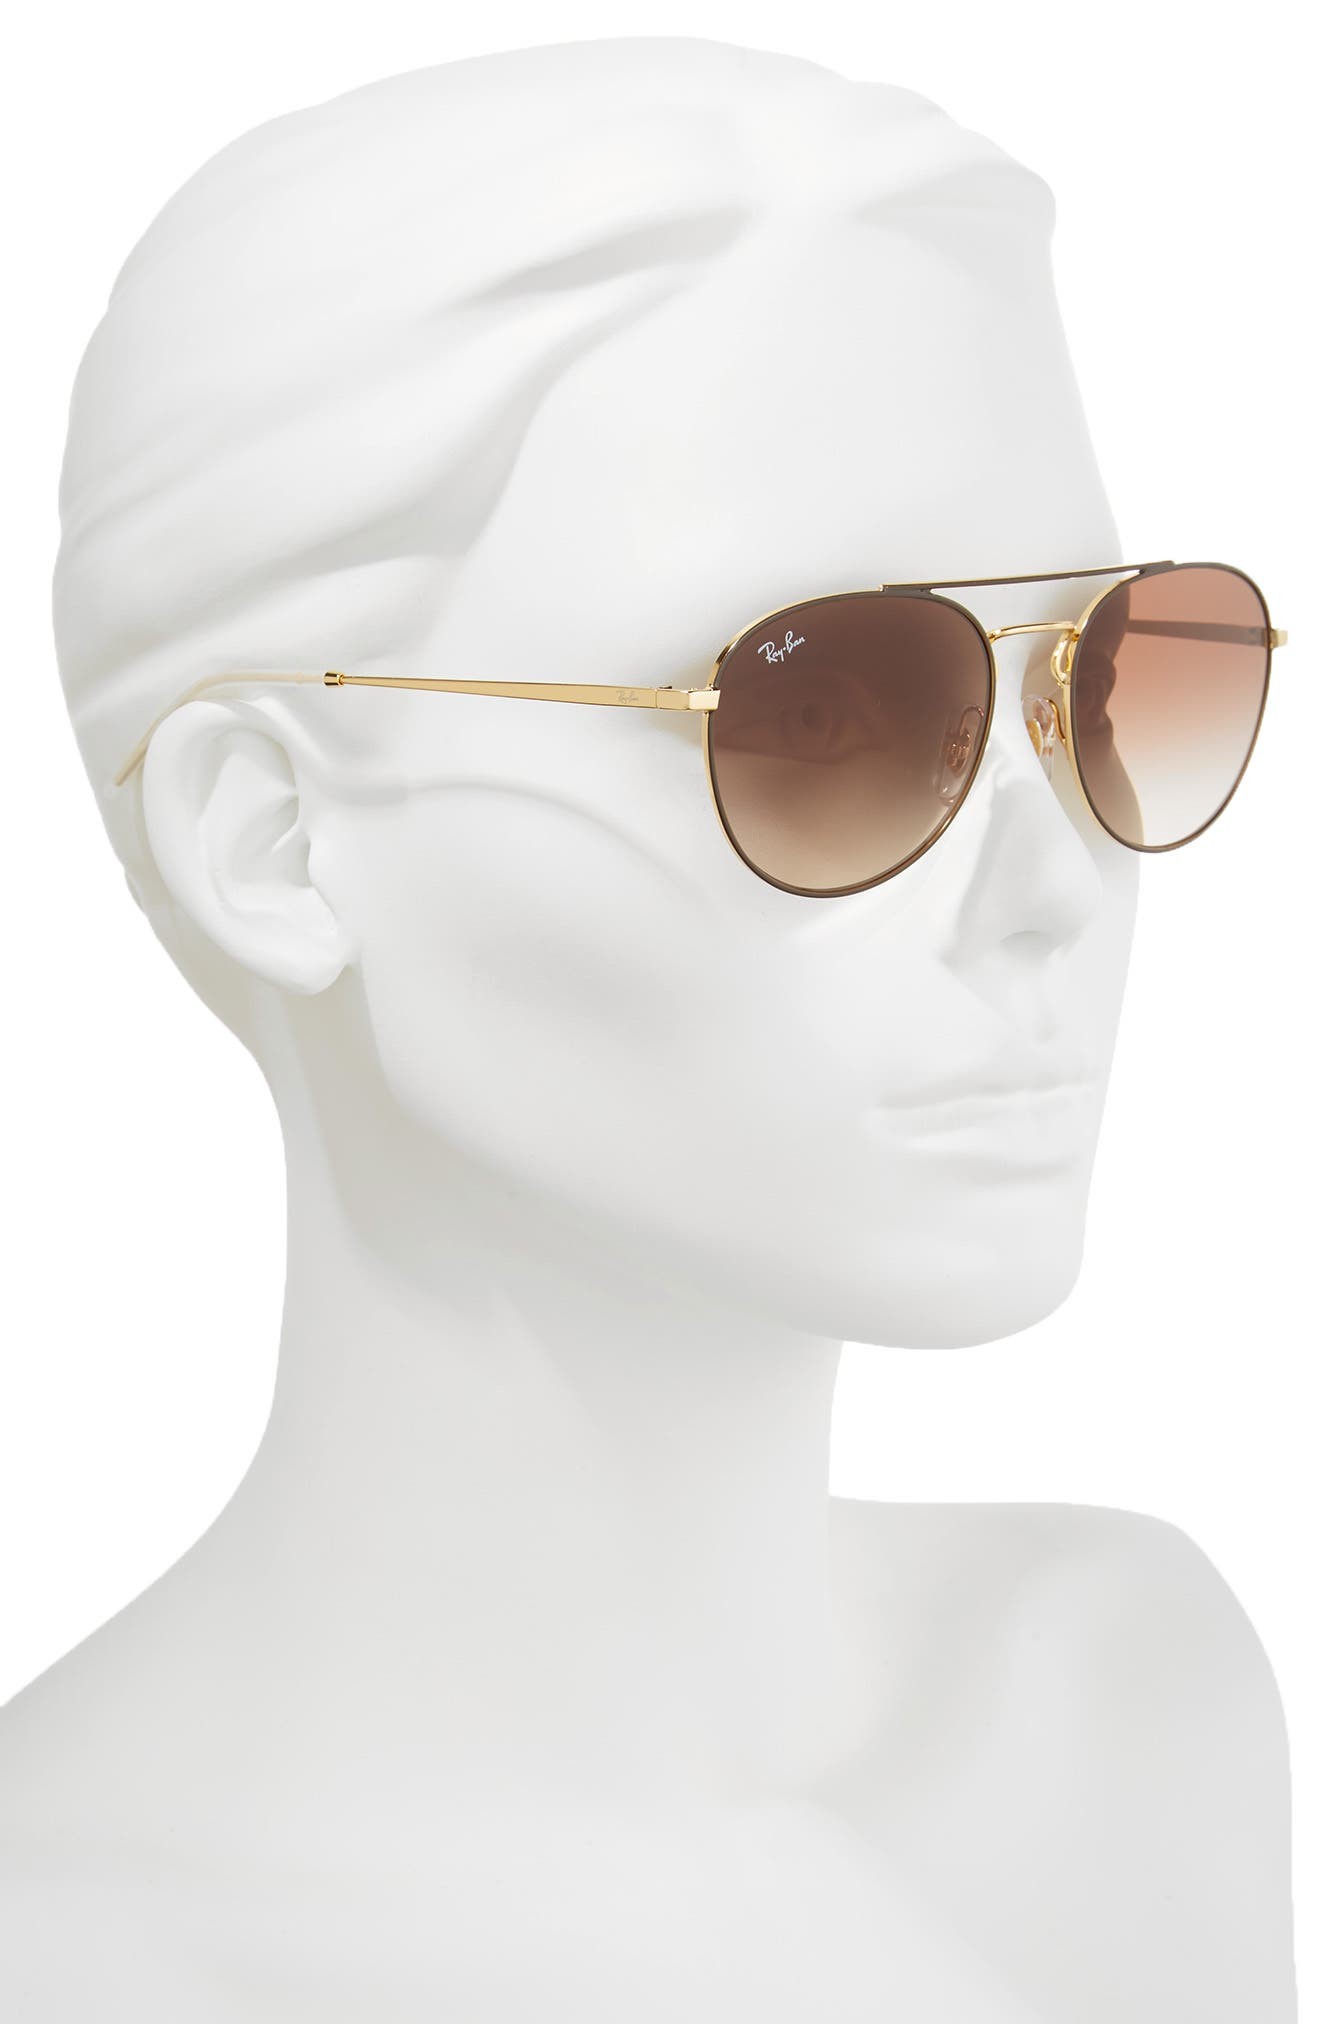 55mm Gradient Lens Round Aviator Sunglasses,                             Alternate thumbnail 8, color,